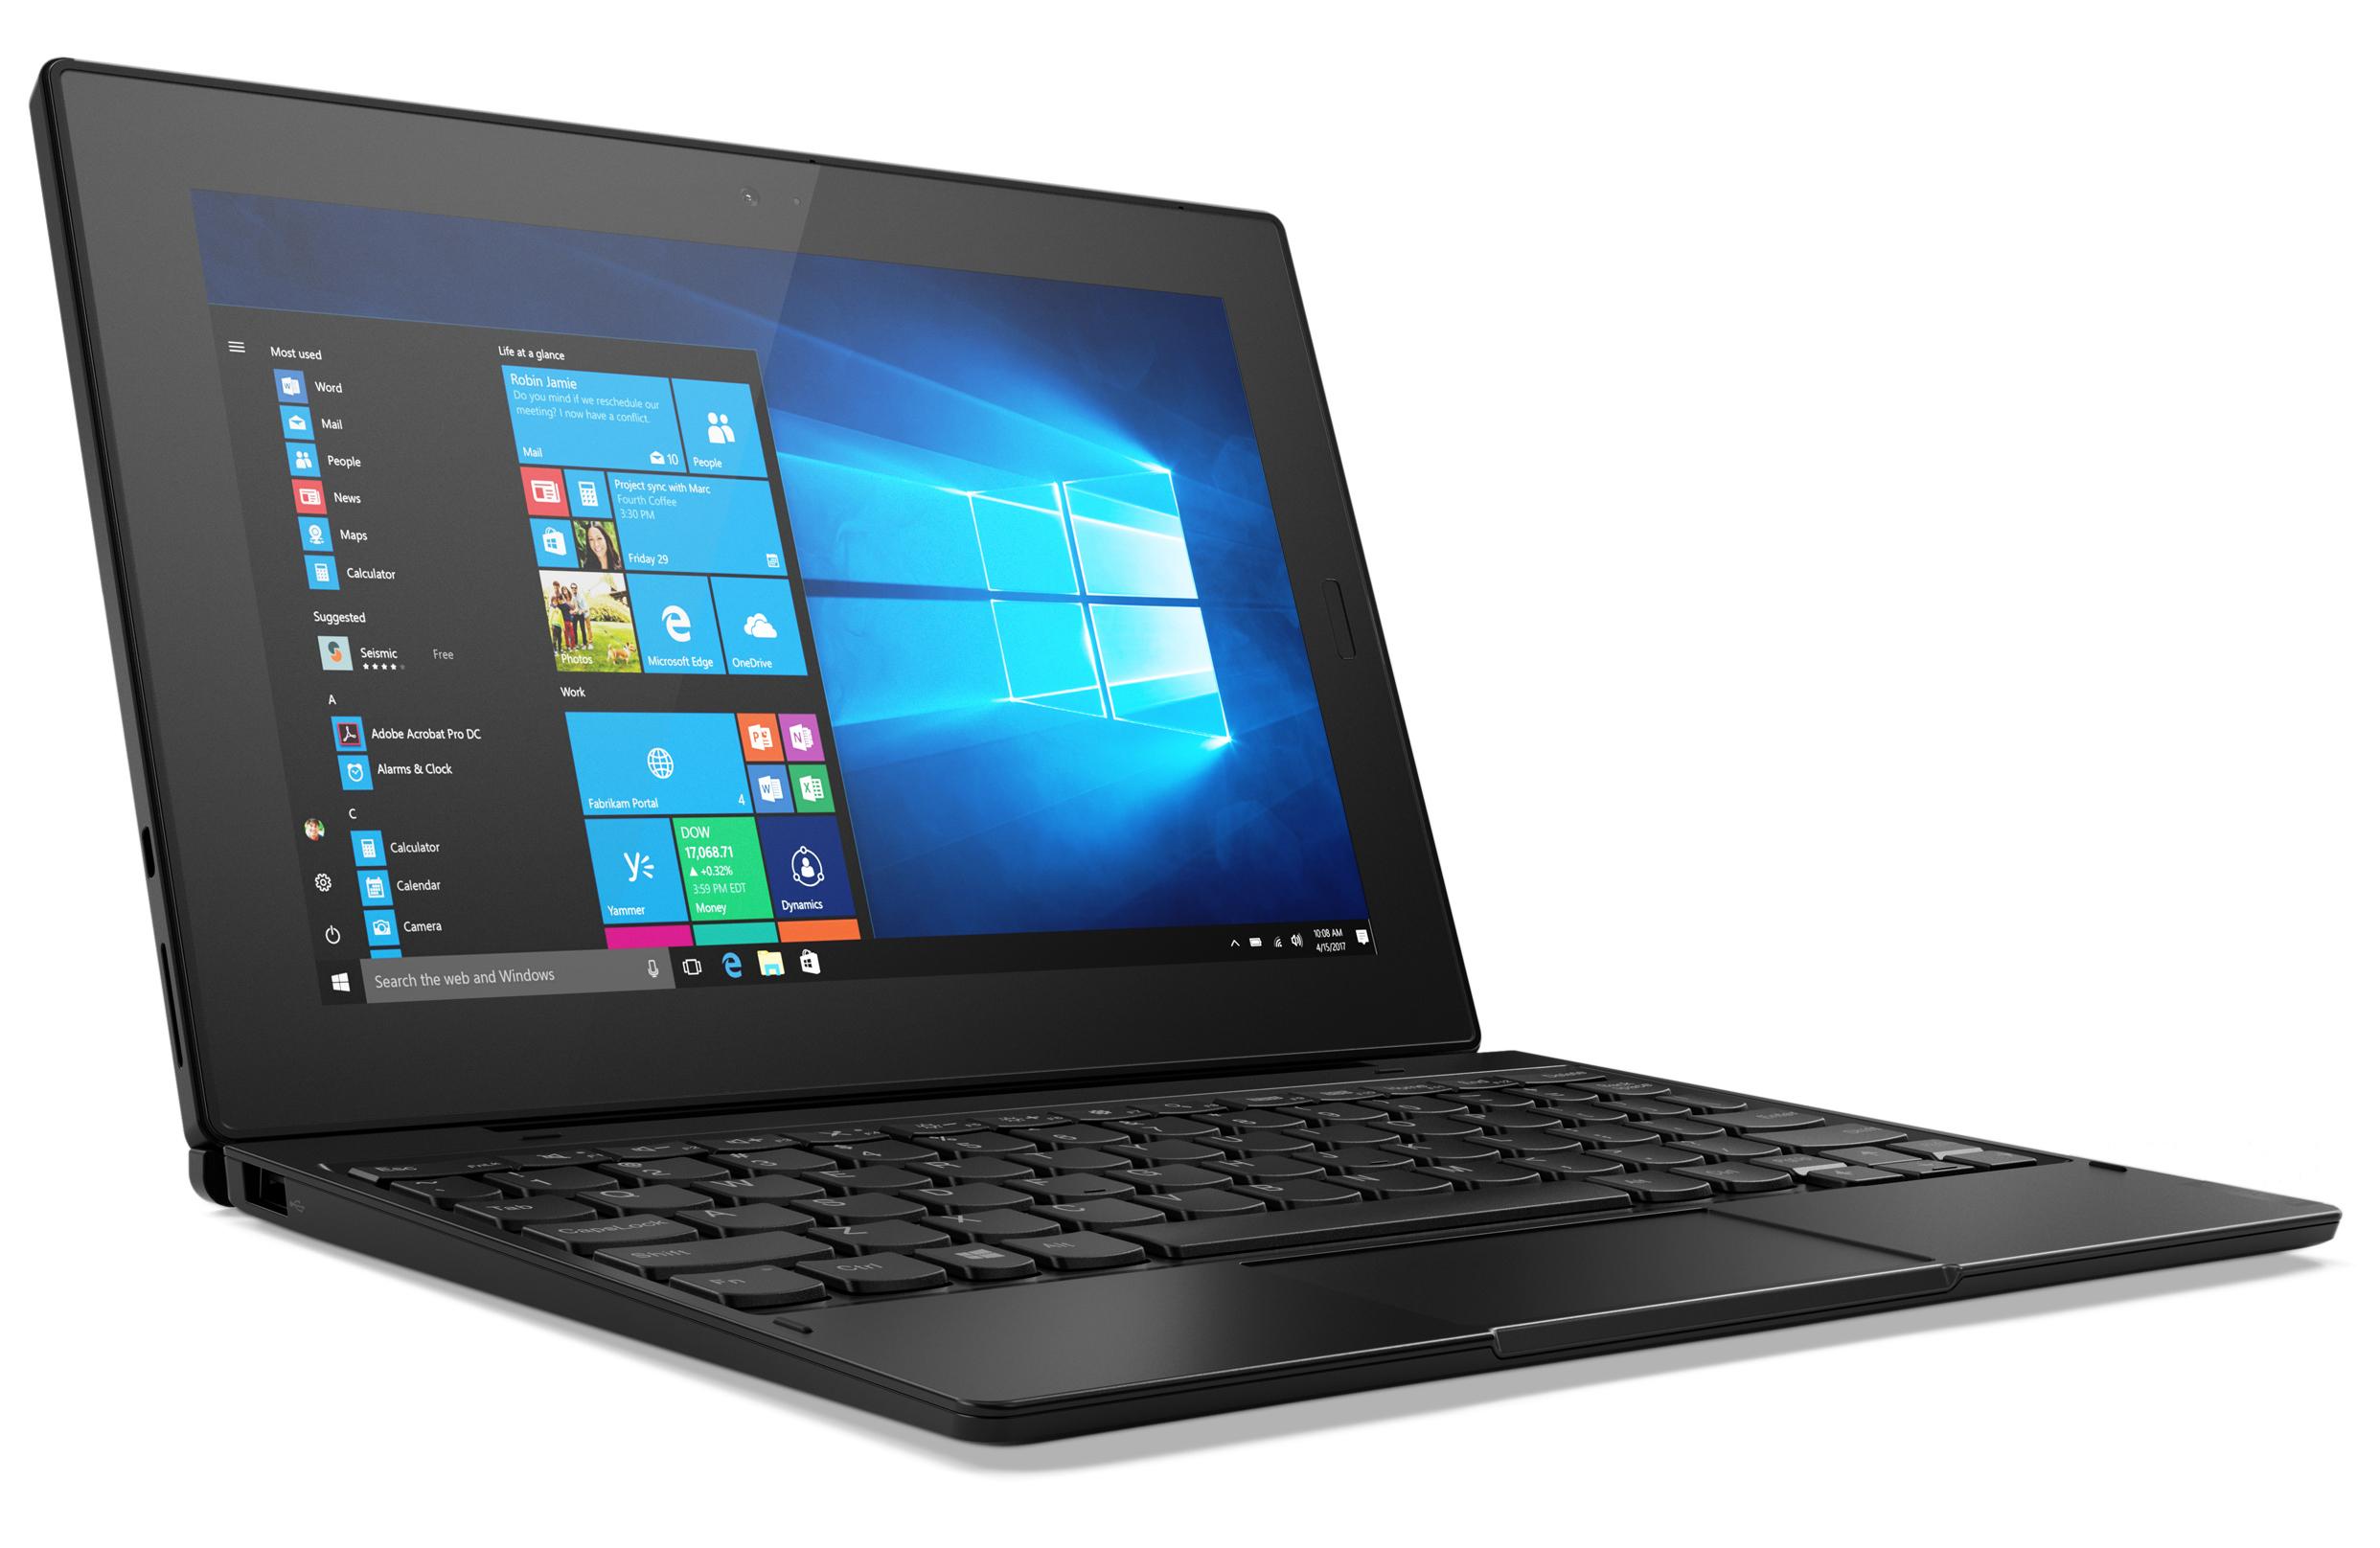 Lenovo Tablet 10 (Celeron N4100, eMMC, LTE, WUXGA) Tablet